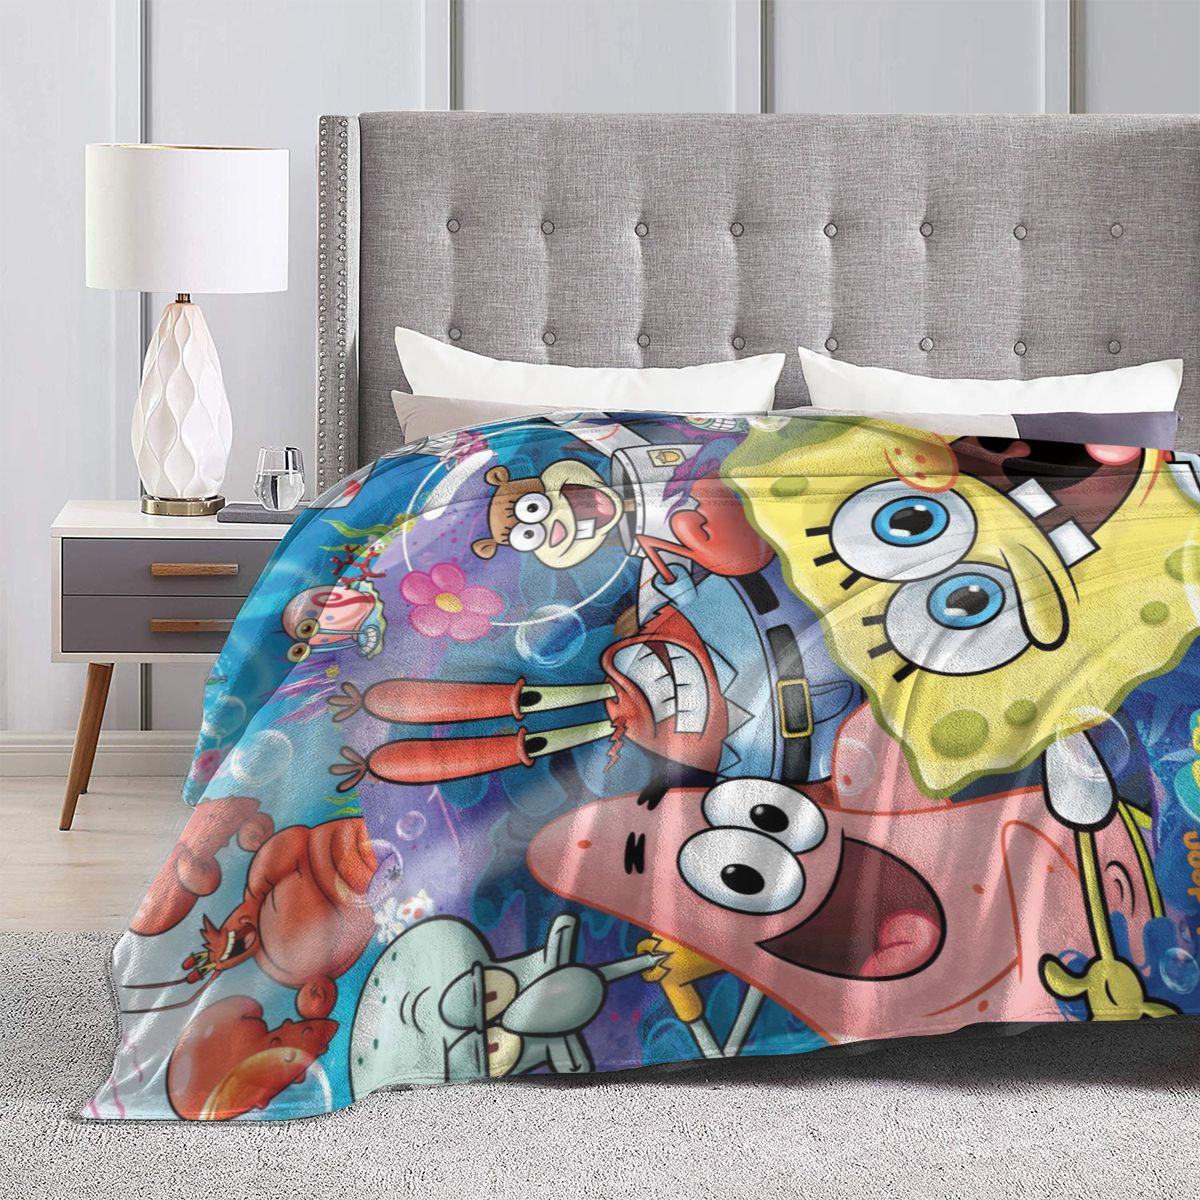 Spongebob Squarepants Super Refined Printed Rug Sofa Blanket Bed Blanket Air Conditioning Blanket Lazada Singapore